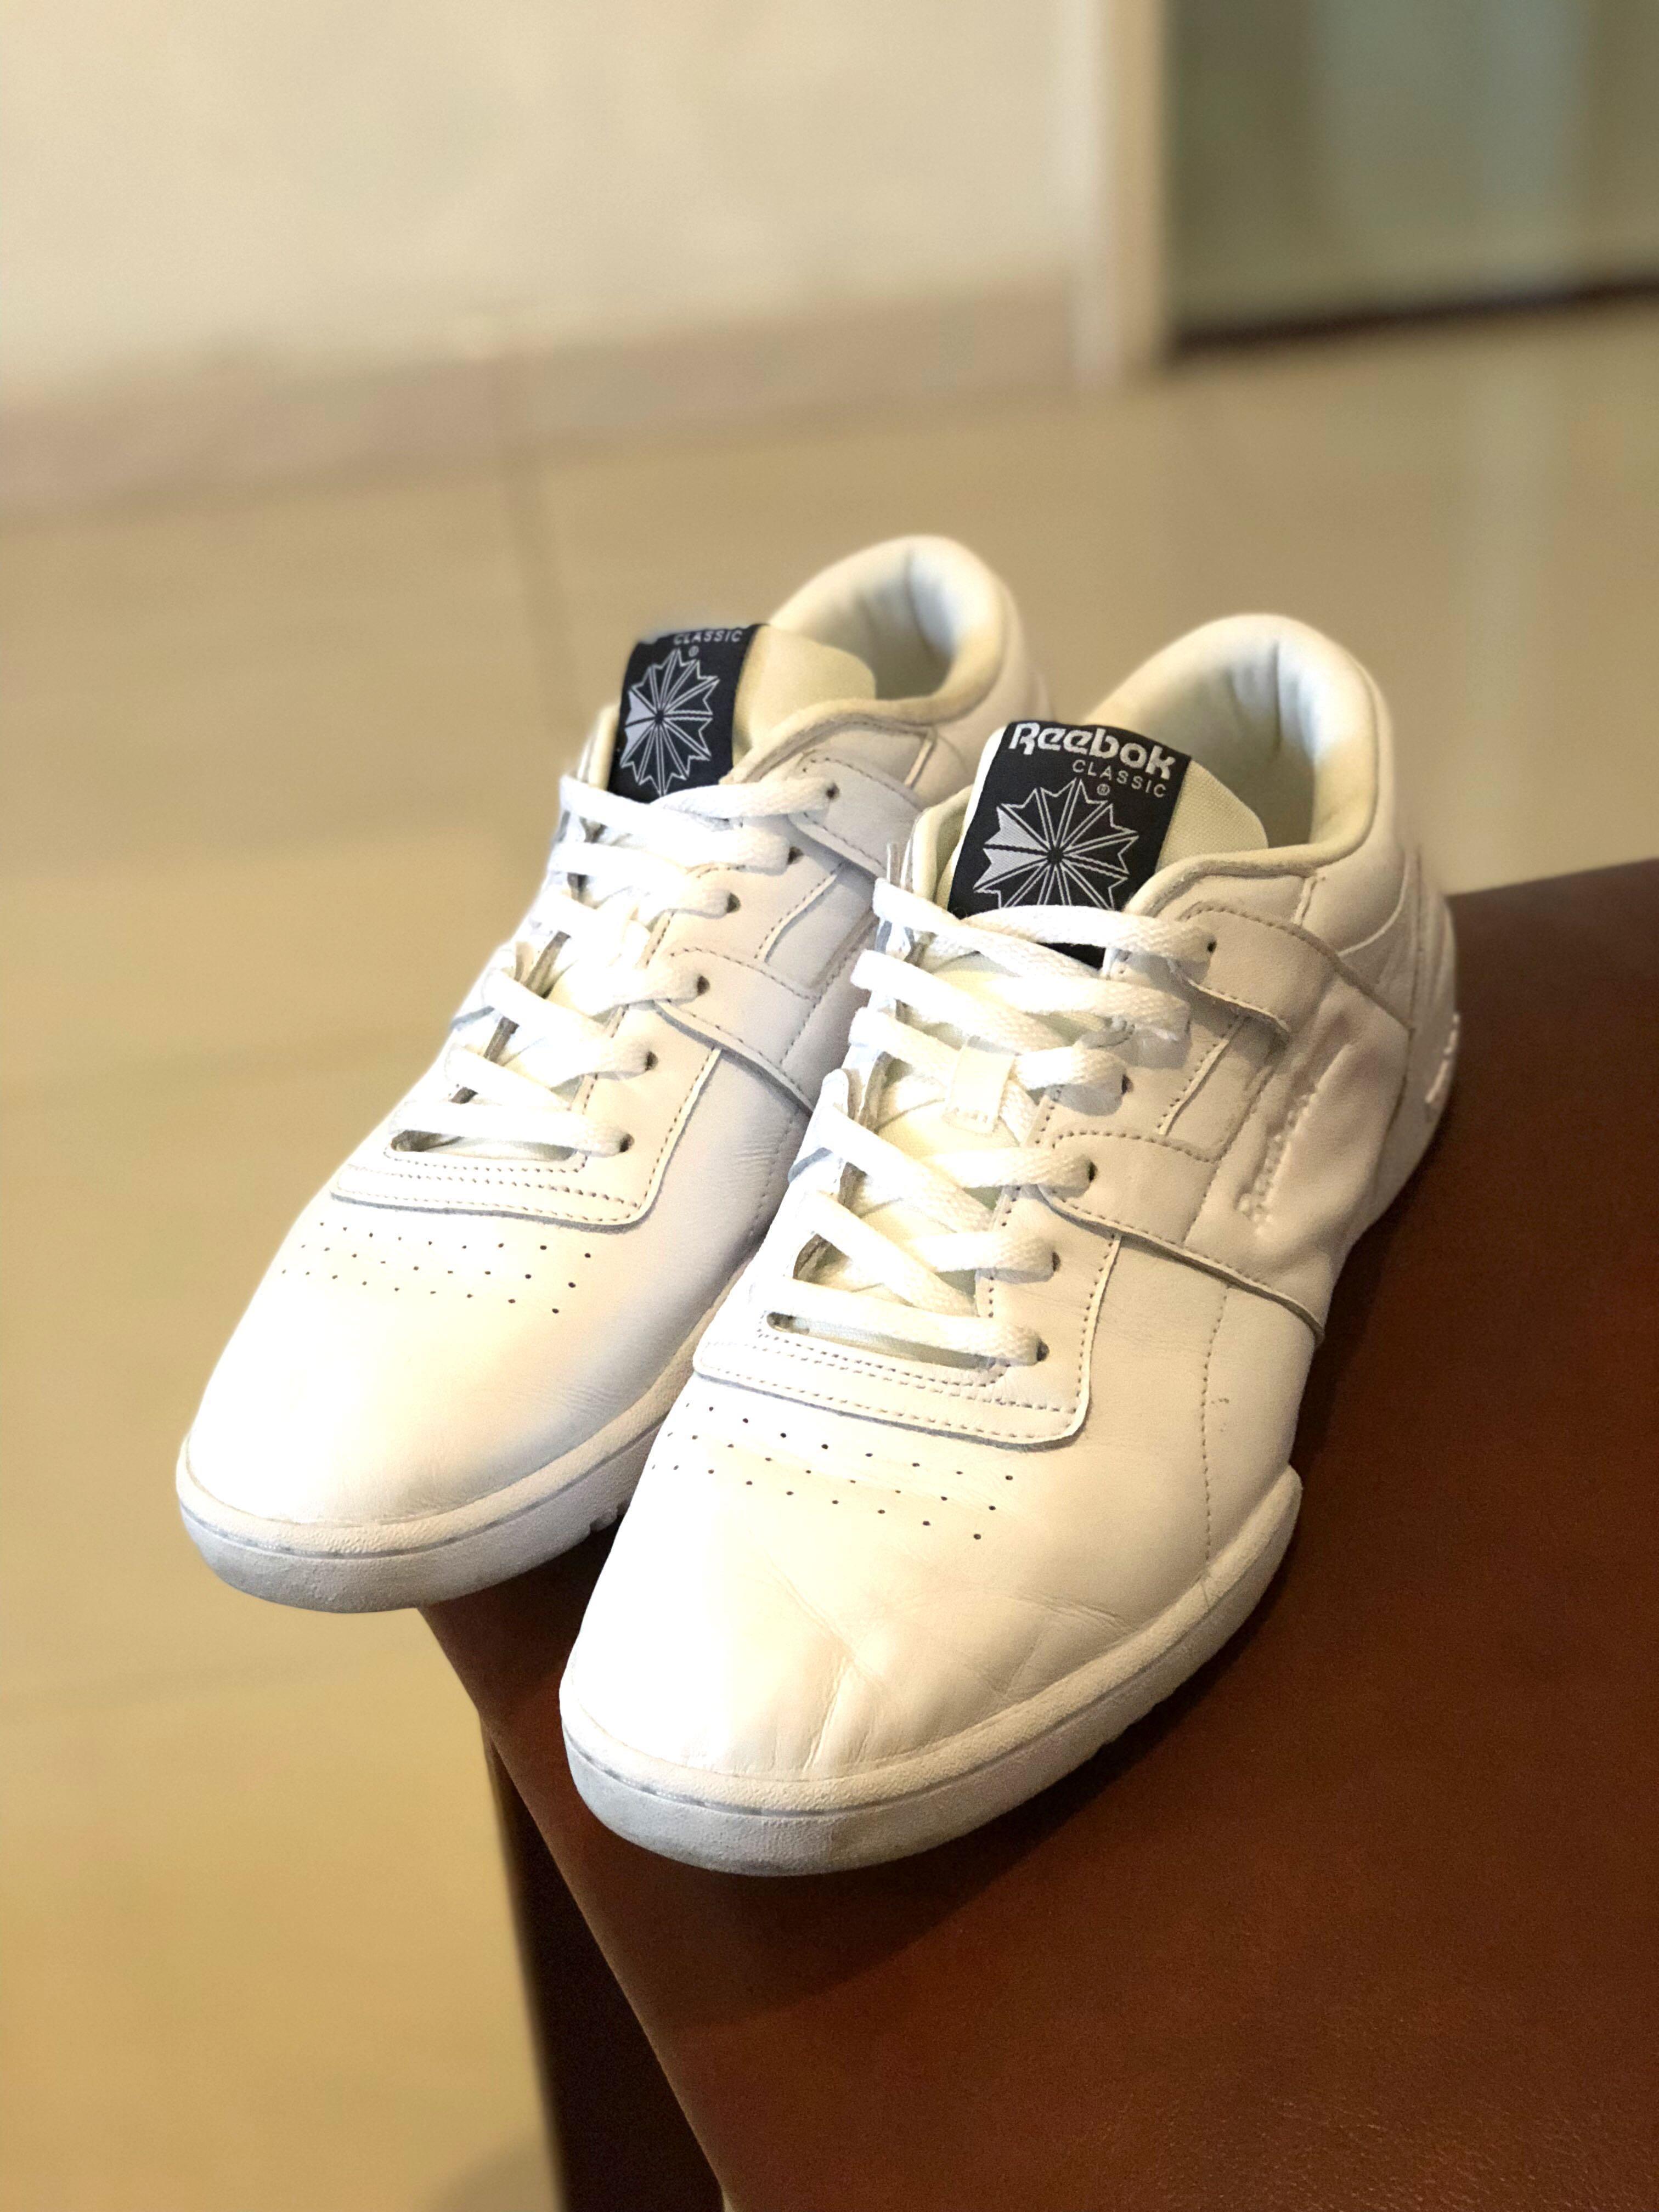 10c223207ca77 Reebok workout clean id lo white sneakers adidas vans nike converse ...